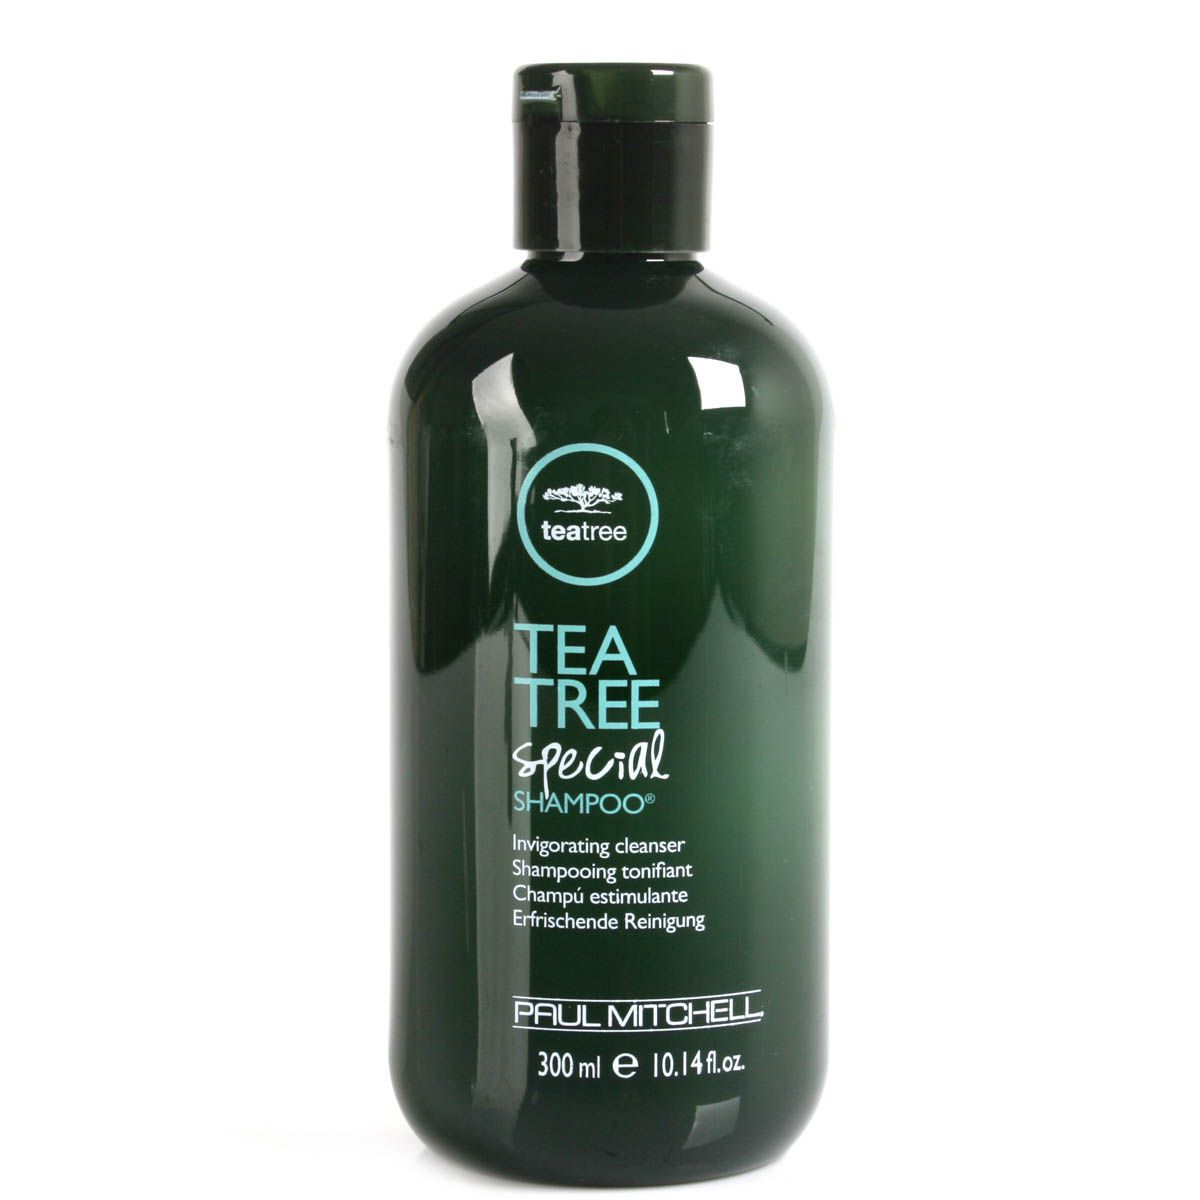 Shampoo Tea Tree Special Paul Mitchell 300ml